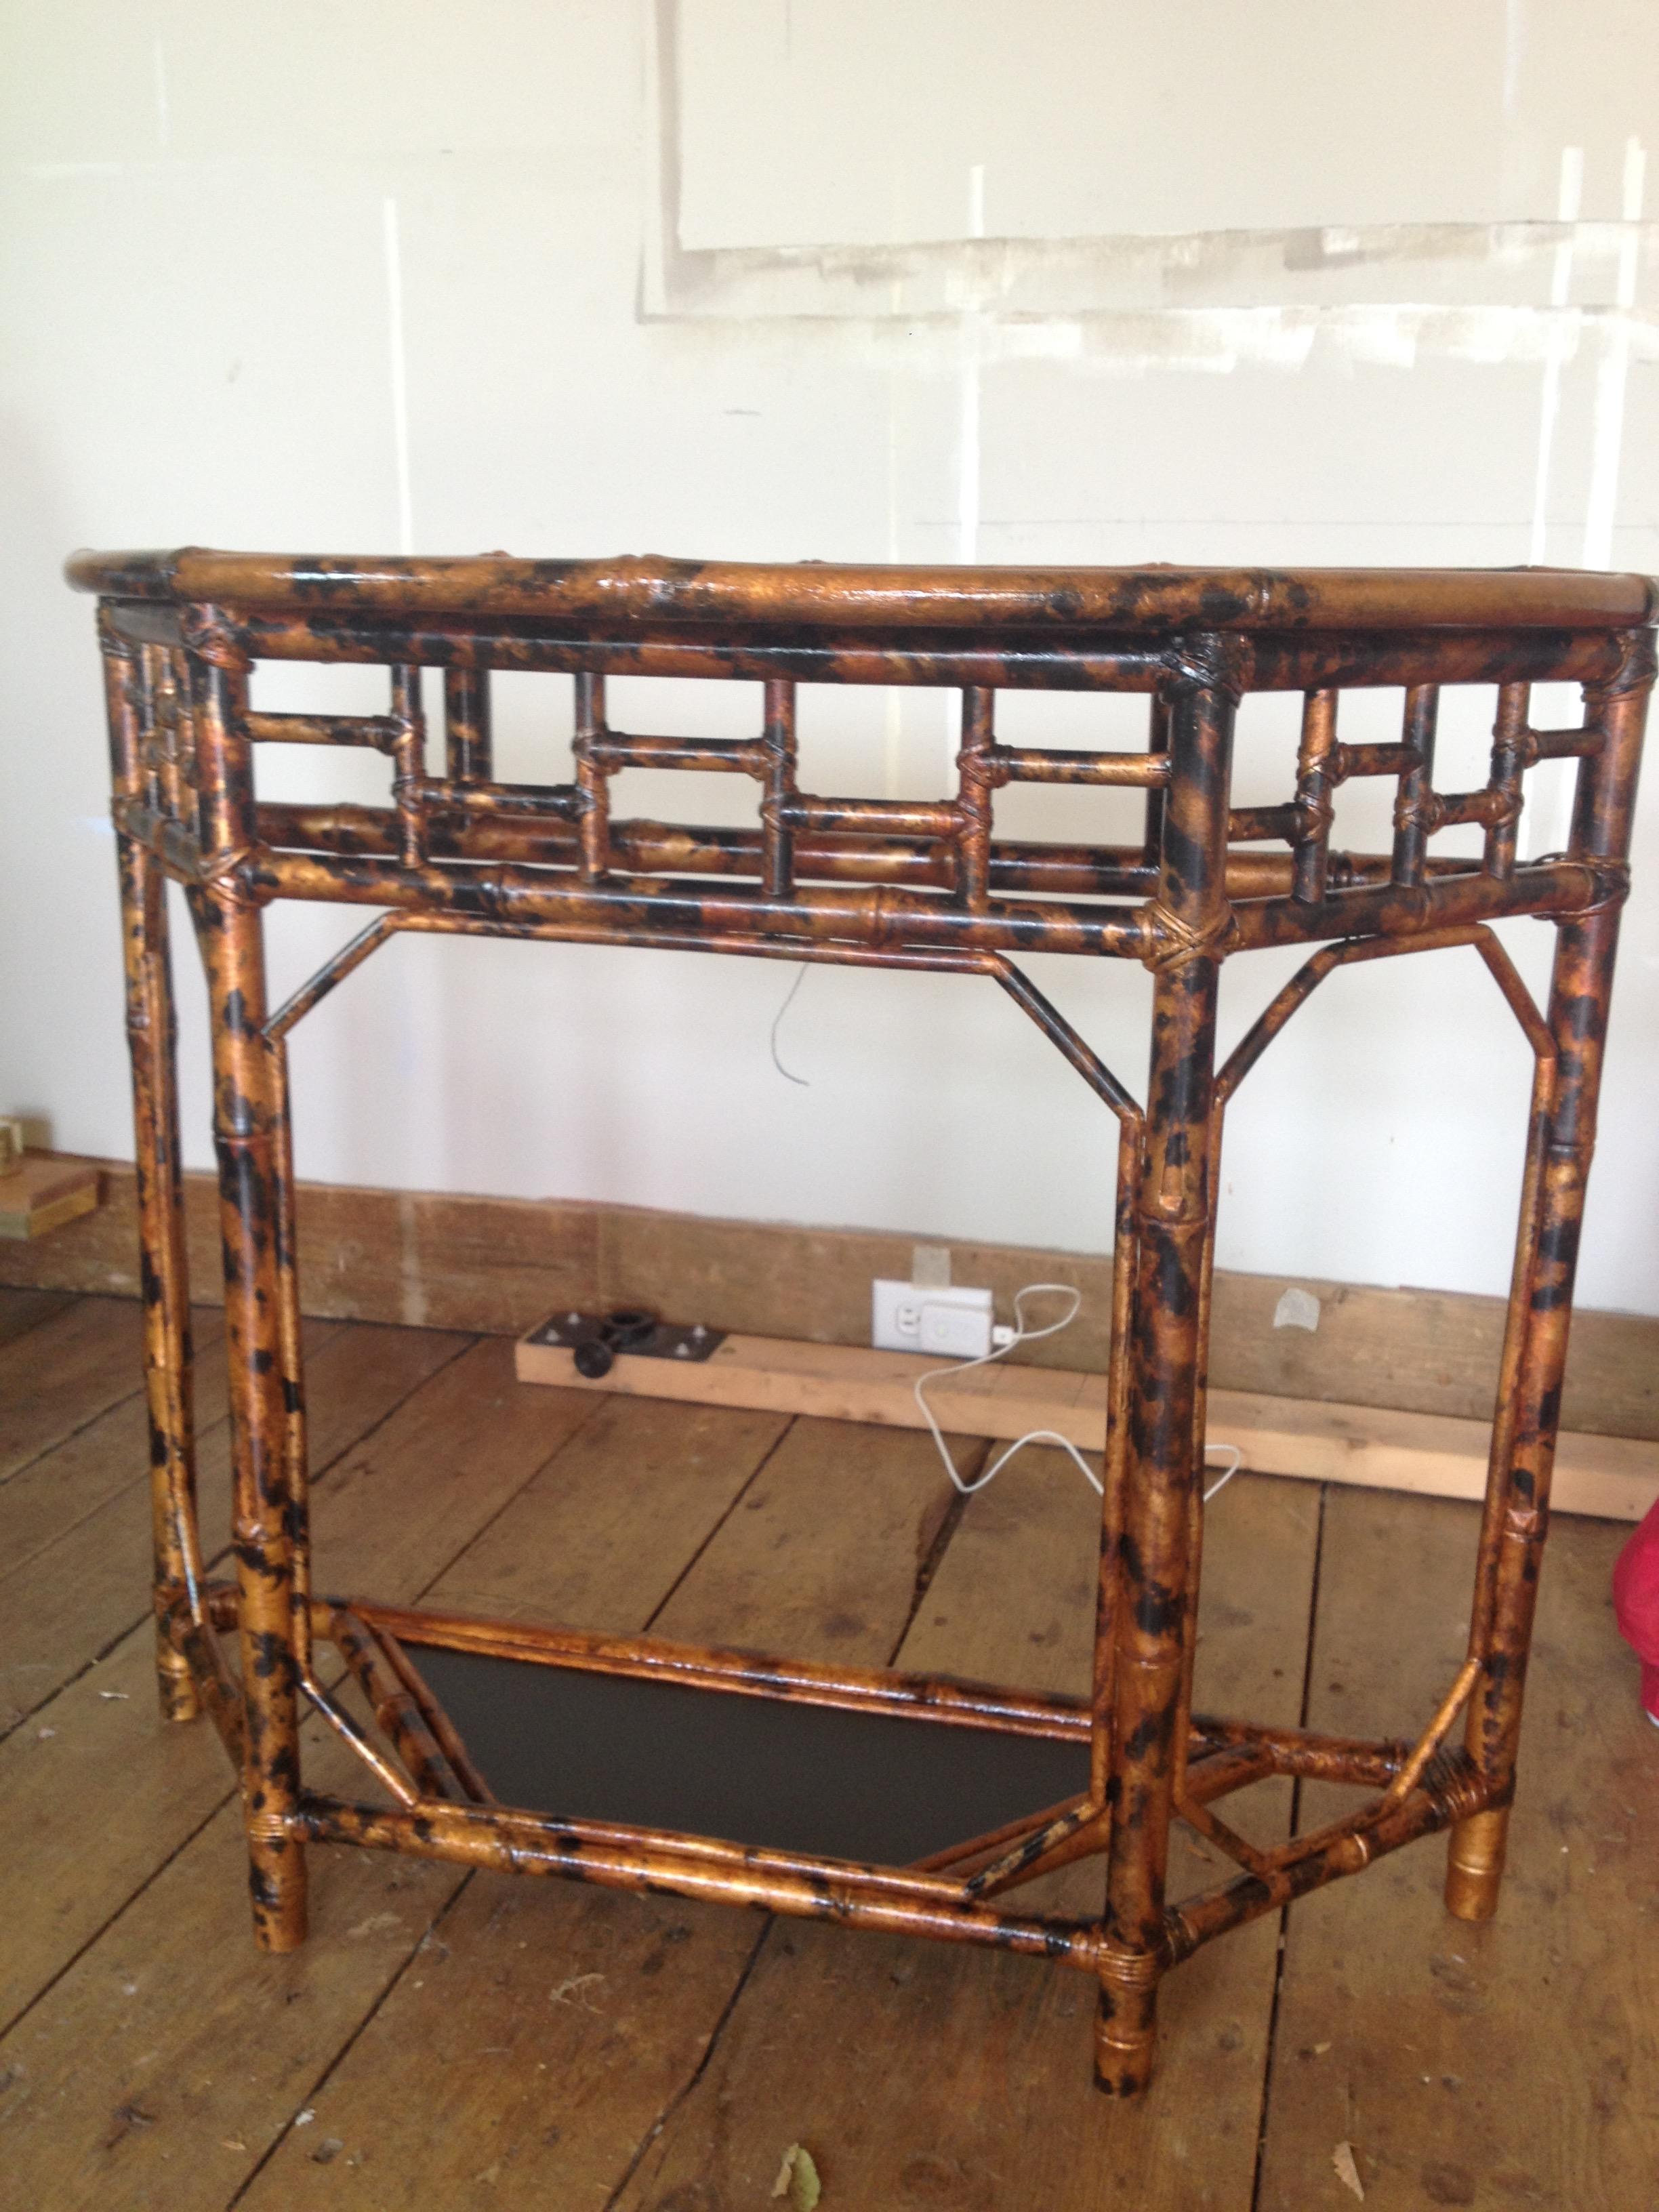 Faux tortoiseshell painted table